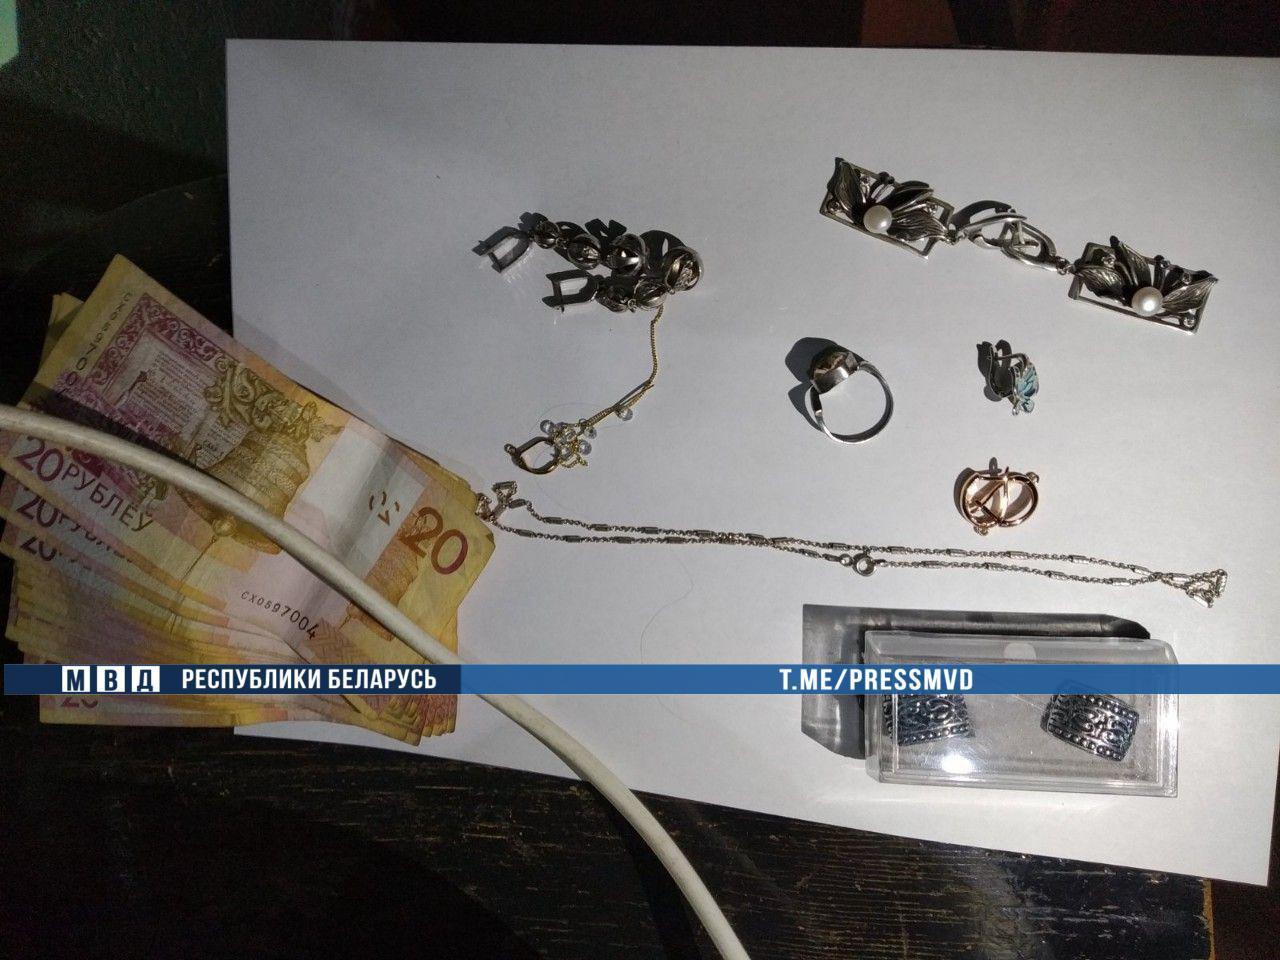 Брестские и гомельские оперативники задержали вора-рецидивиста